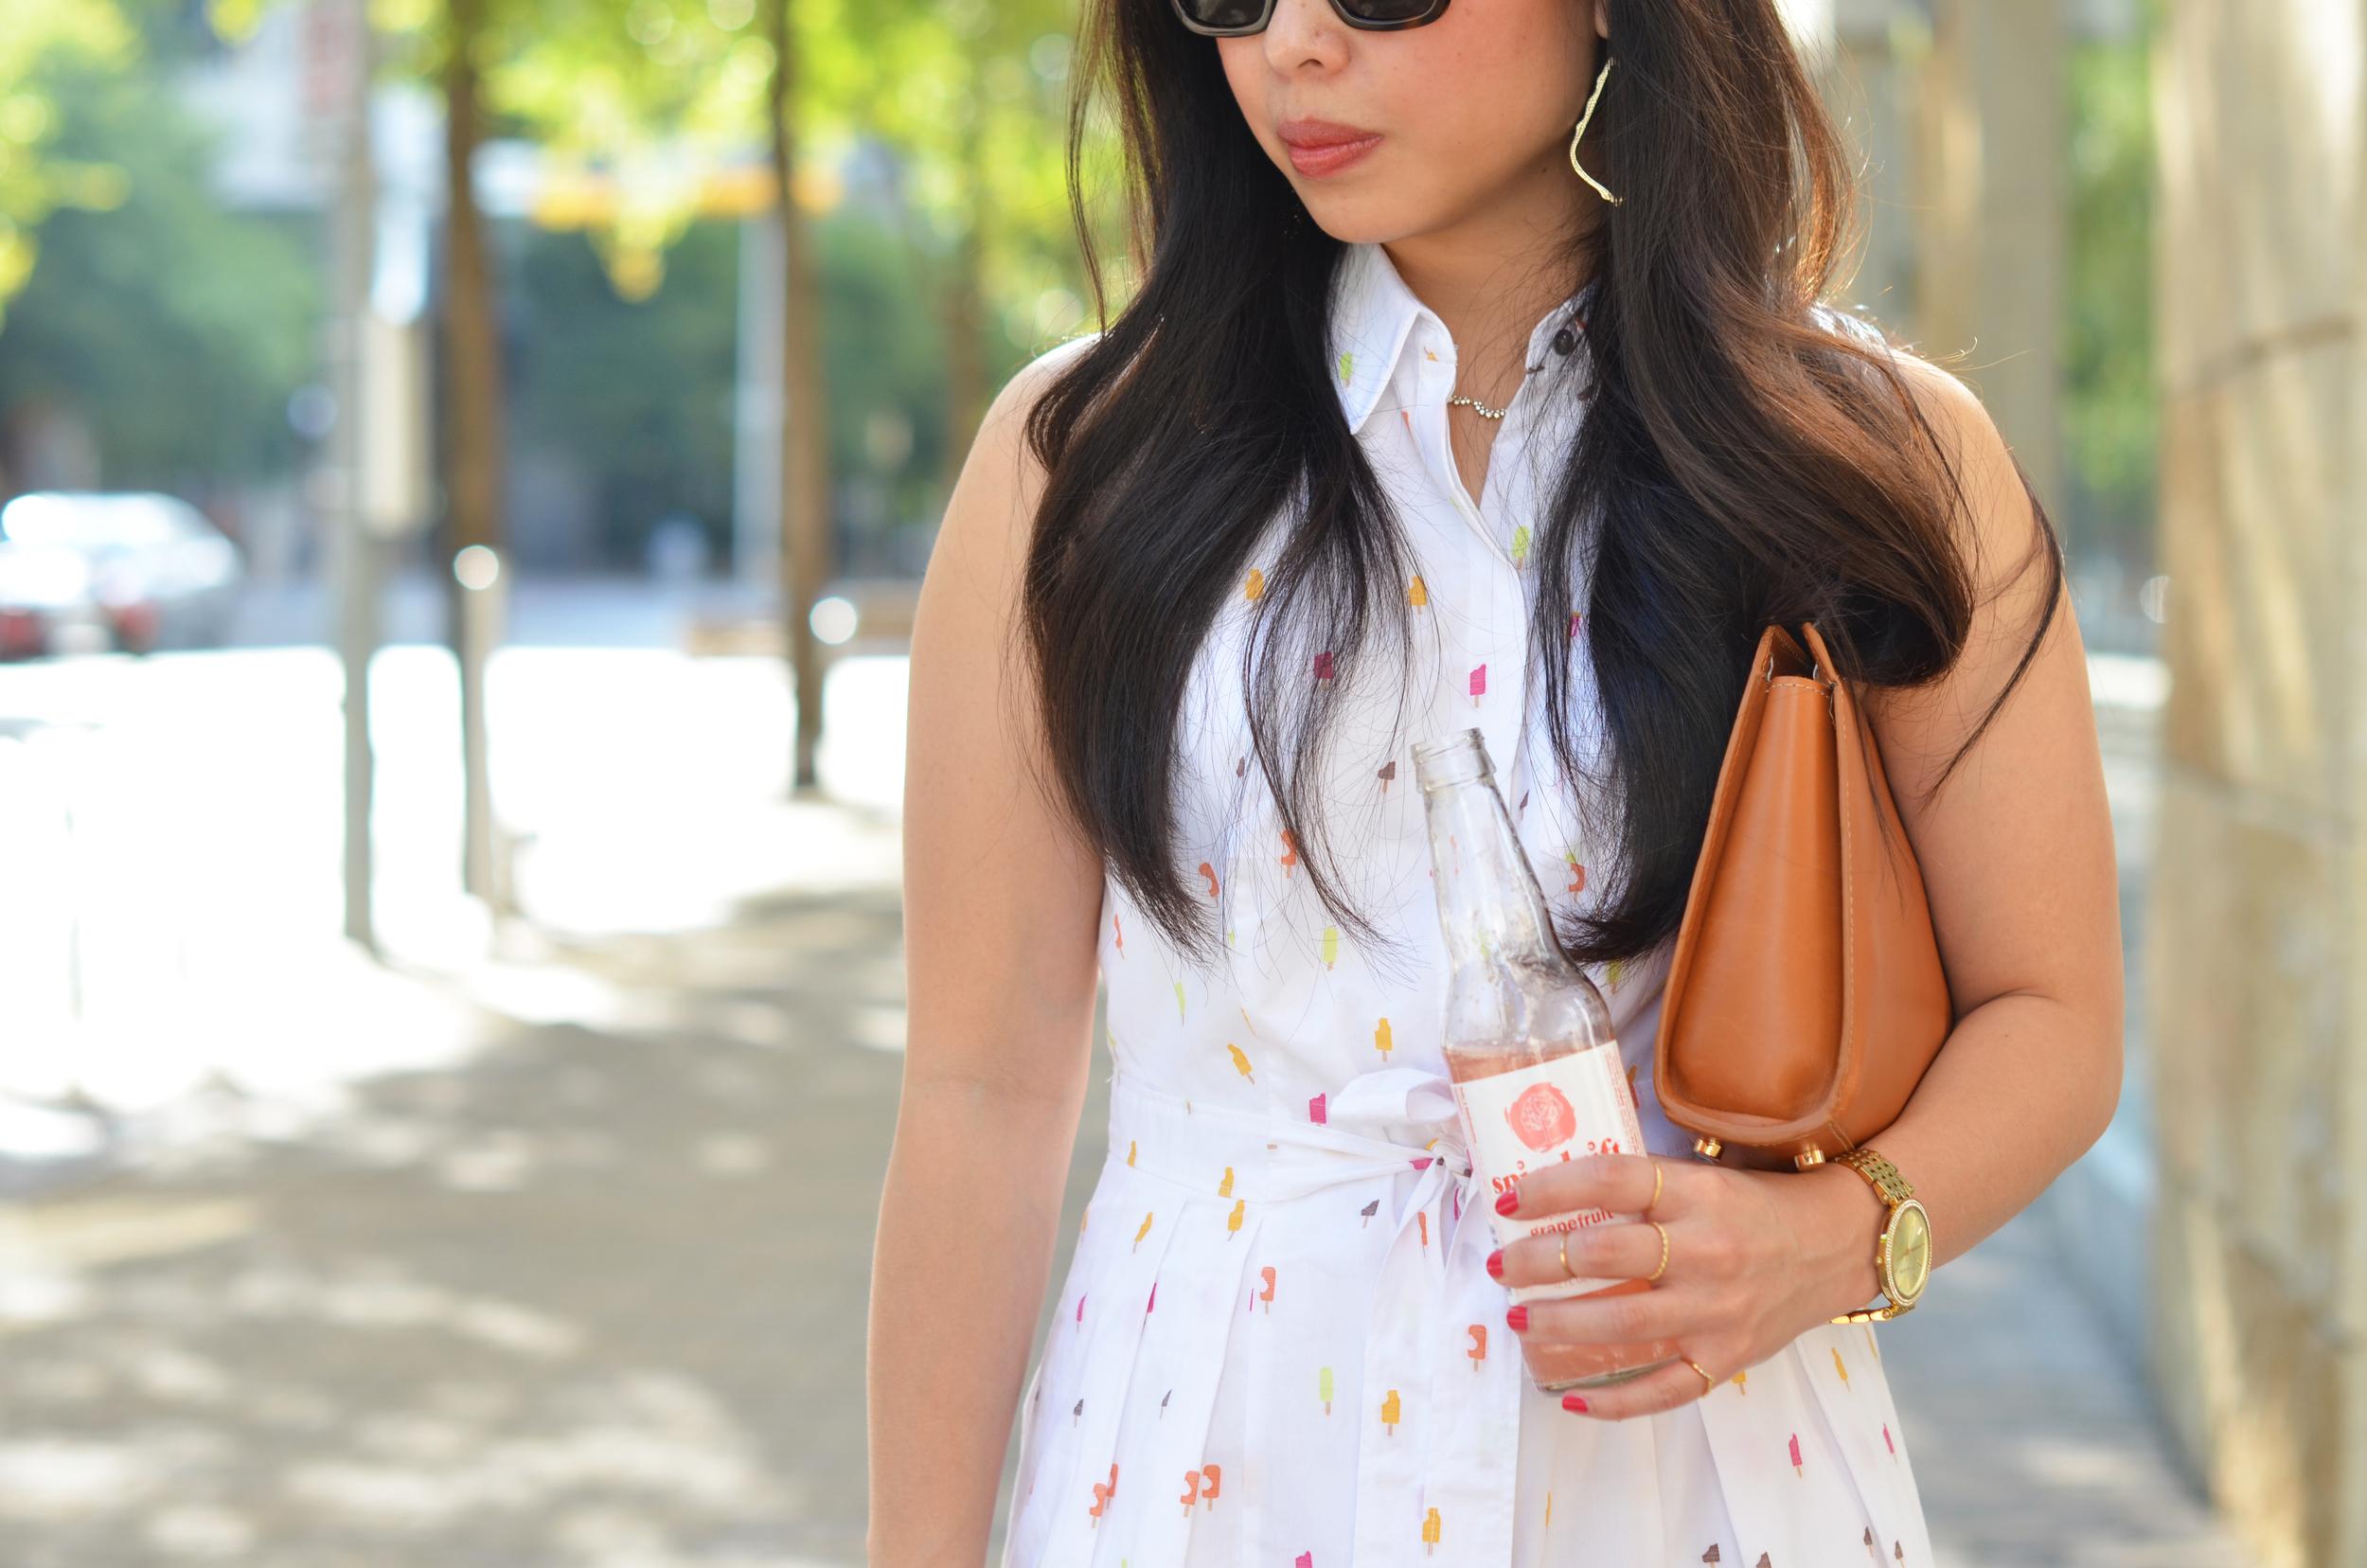 the popsicle shirtdress -- jannadoan.com